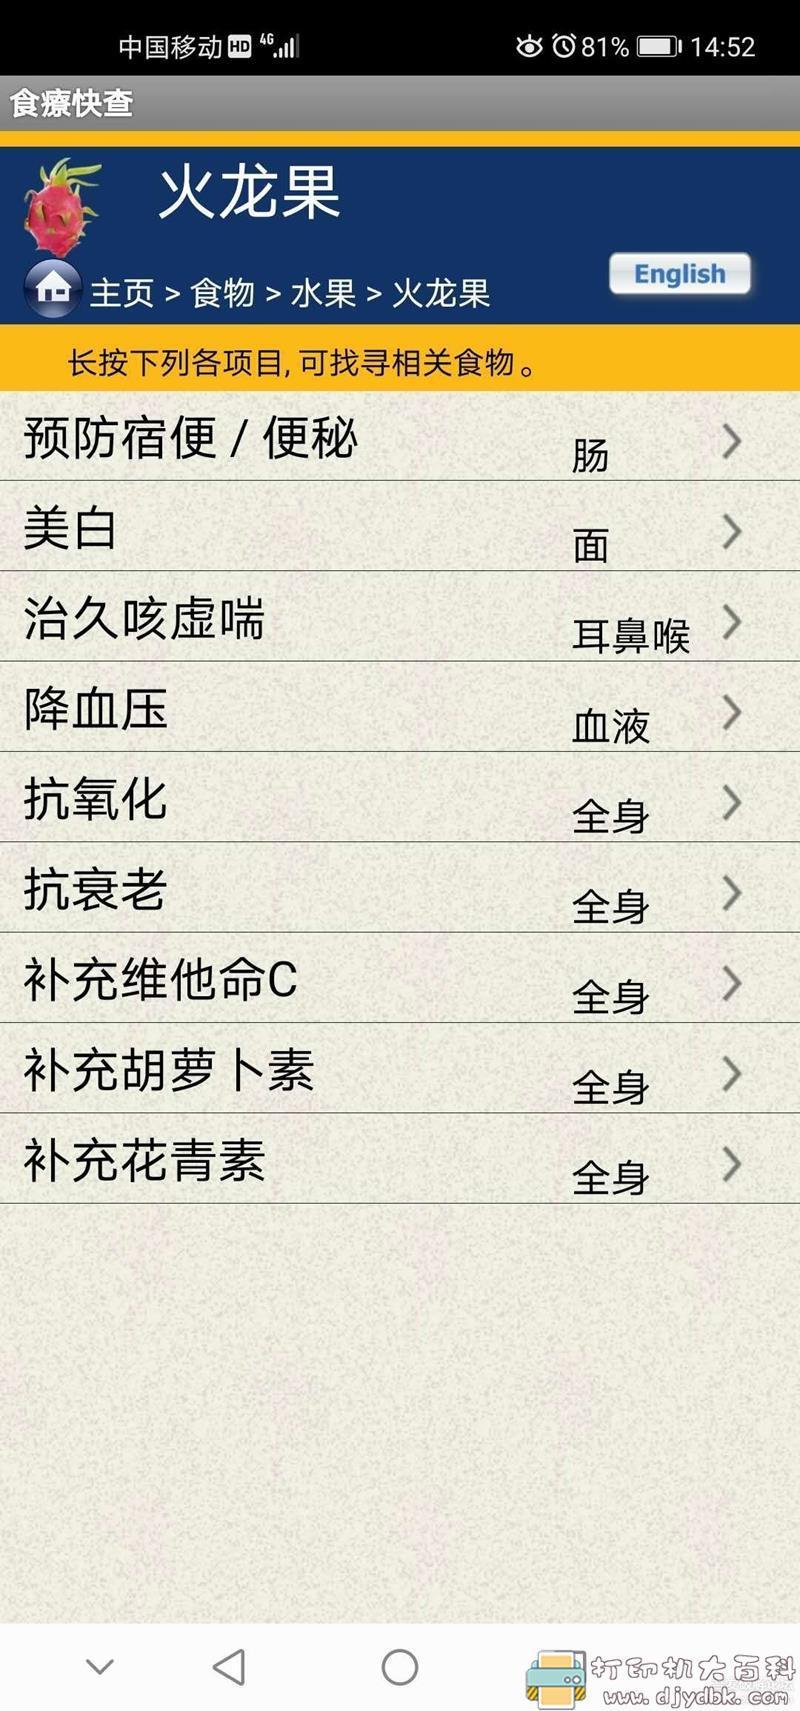 [Android]养生系列【食疗快查app】了解你吃的食物的特性图片 No.6